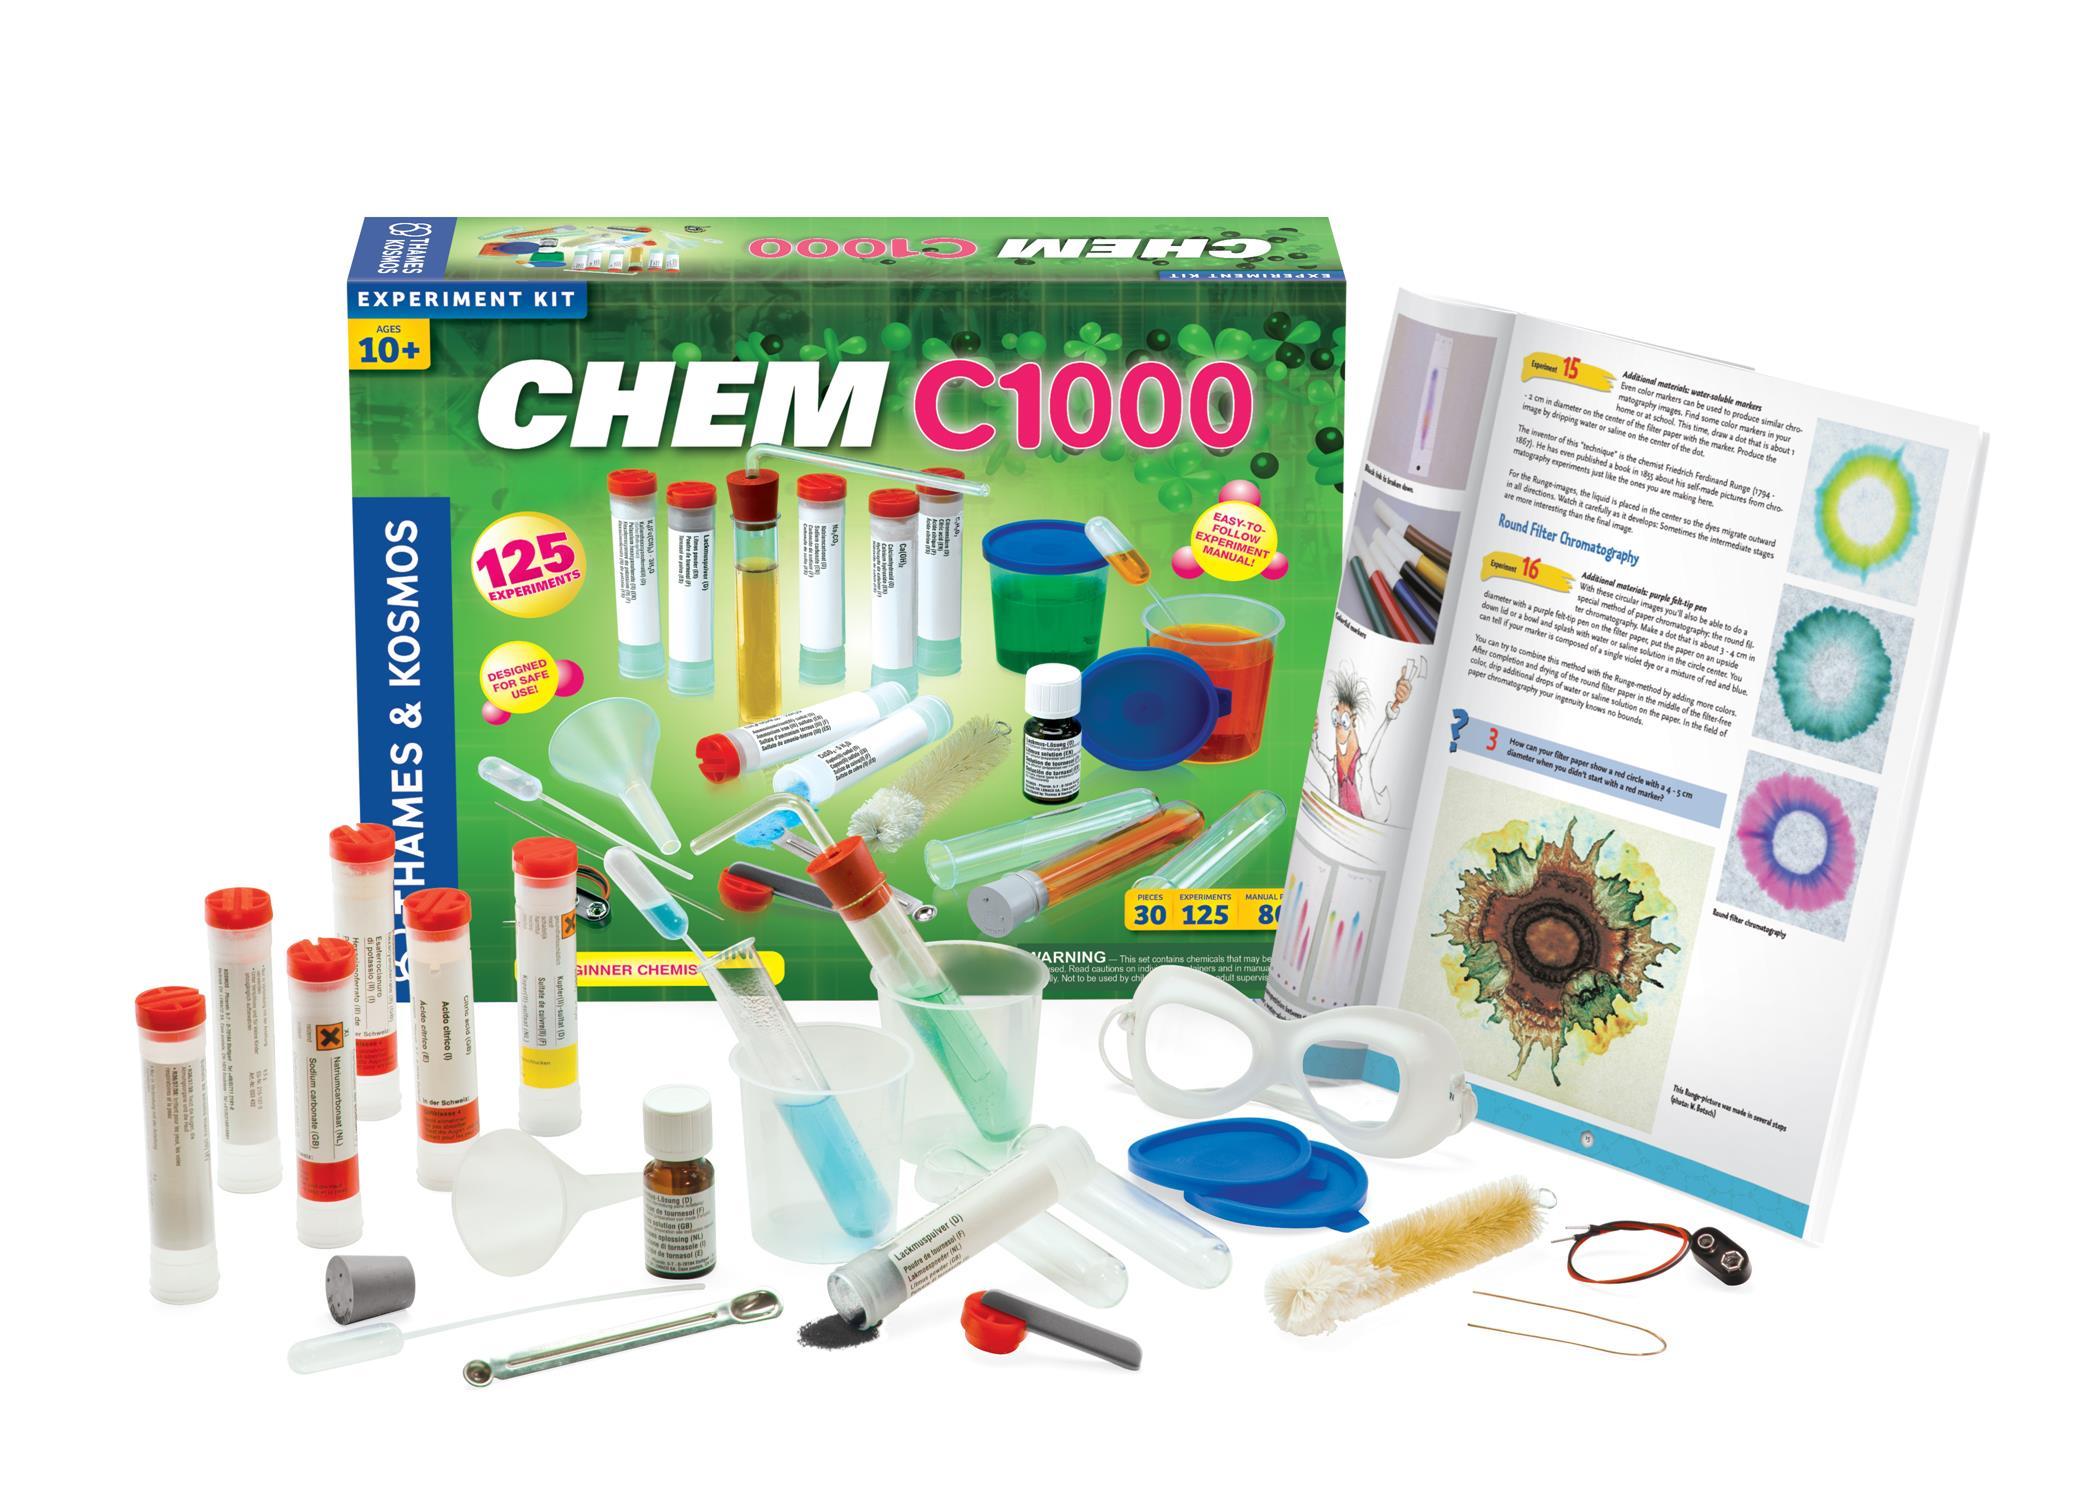 CHEM C1000 Chemistry Experiment Kit - ScientificsOnline com